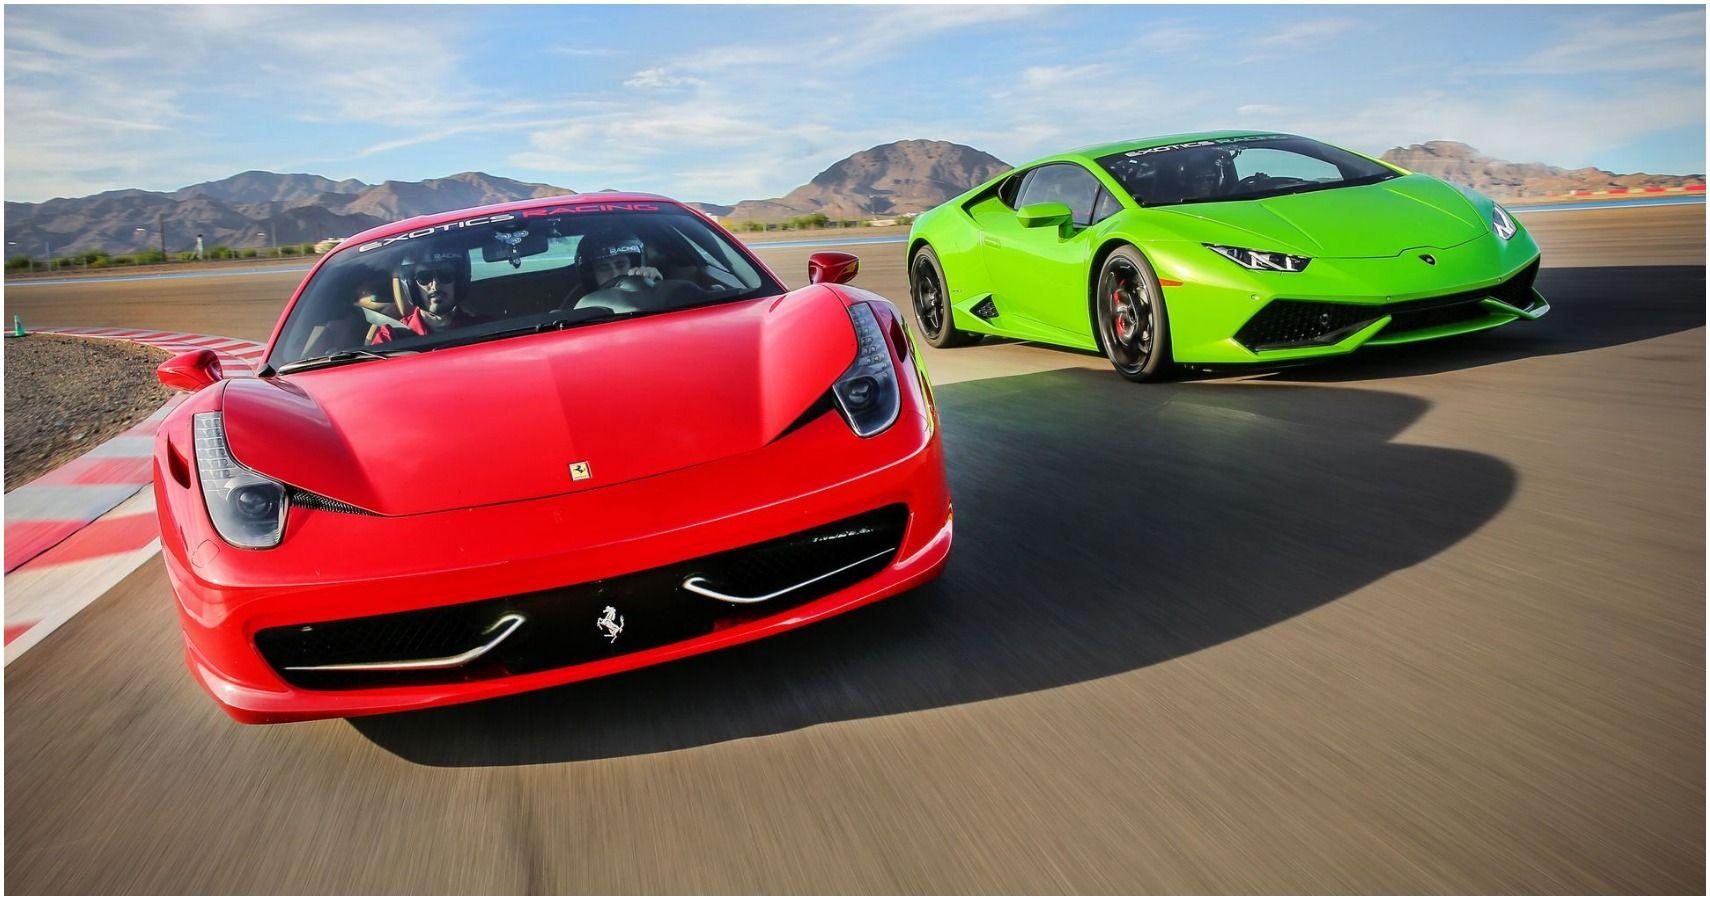 Ferrari Vs Lamborghini Who Really Has The Faster Supercars